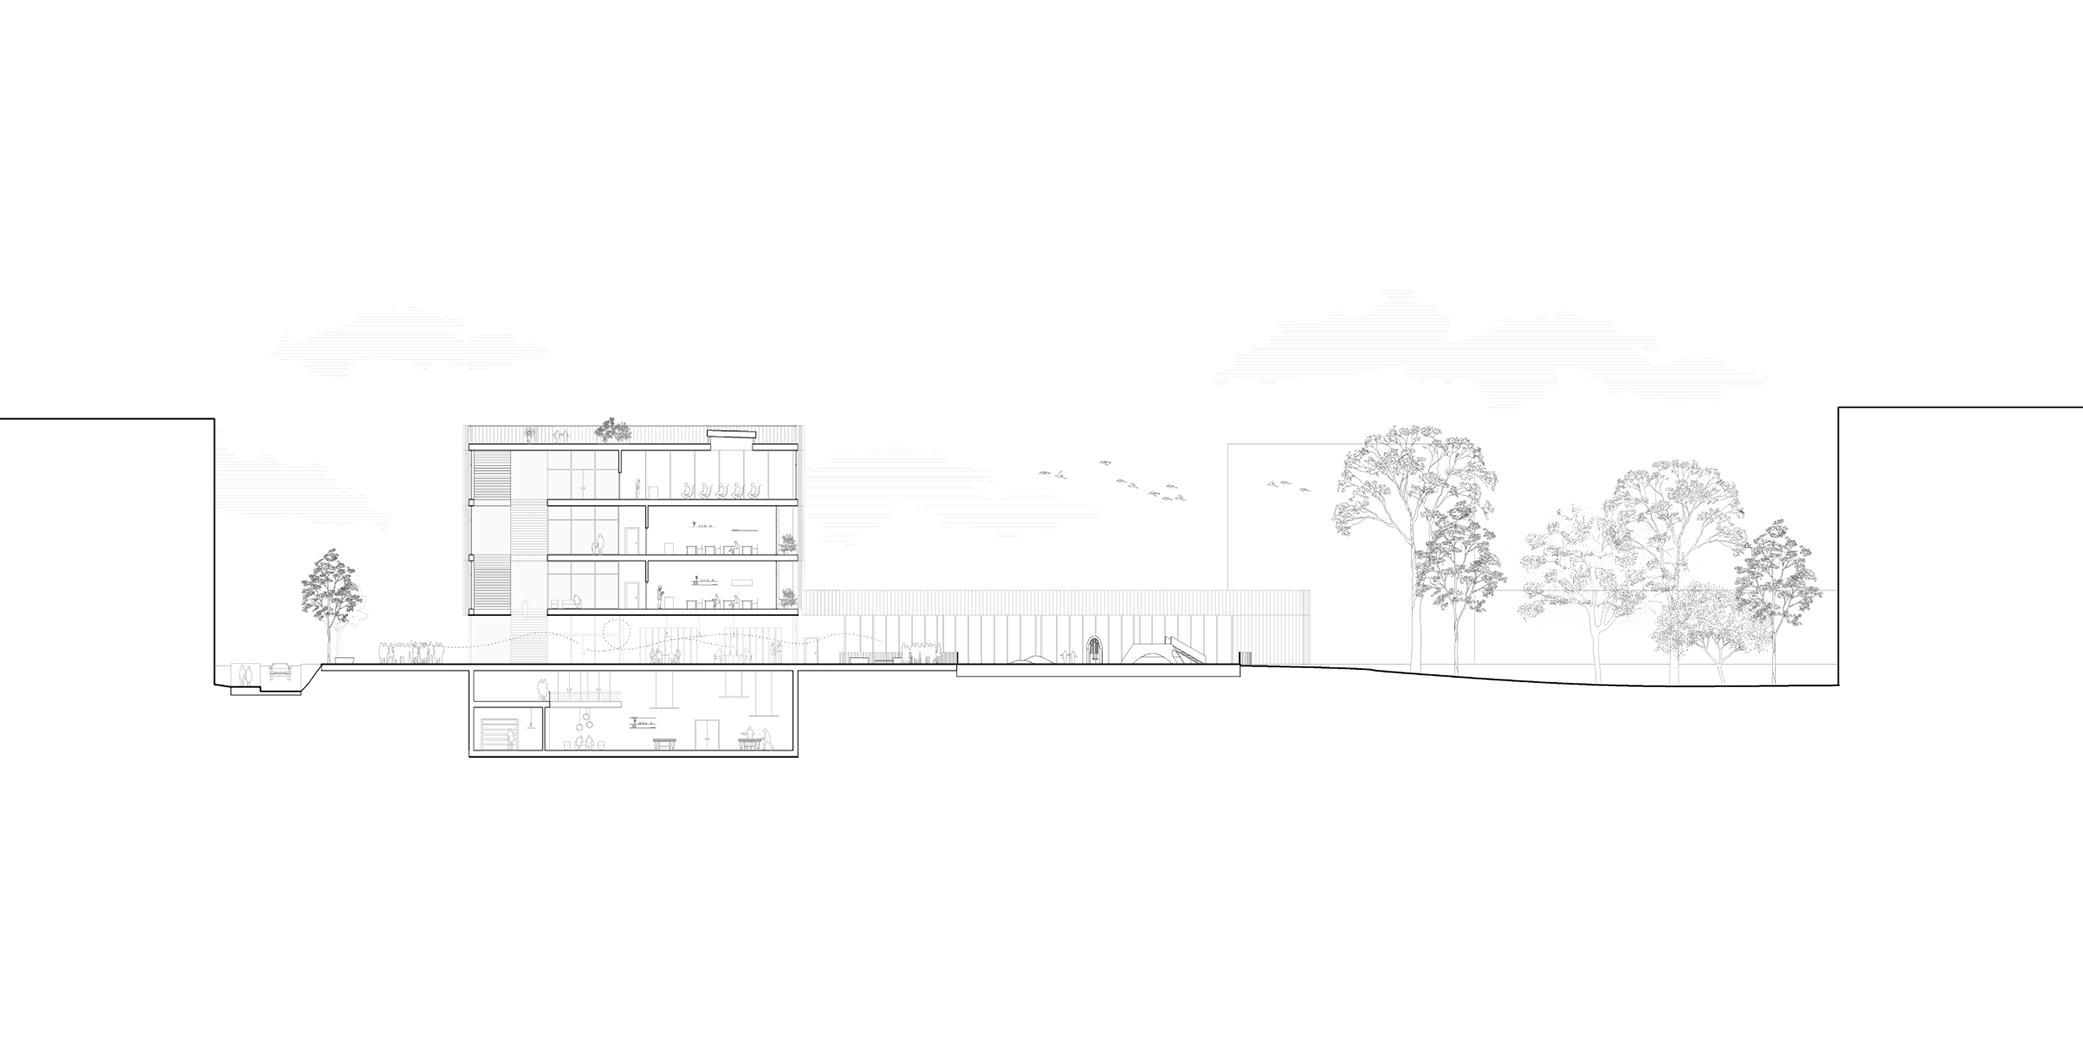 OCA architects New Elementary School and Kindergarten for - Nová ZS a MS pro - Dolní Měcholupy Hernan Lleida Ruiz Bernardo Garcia Morales23